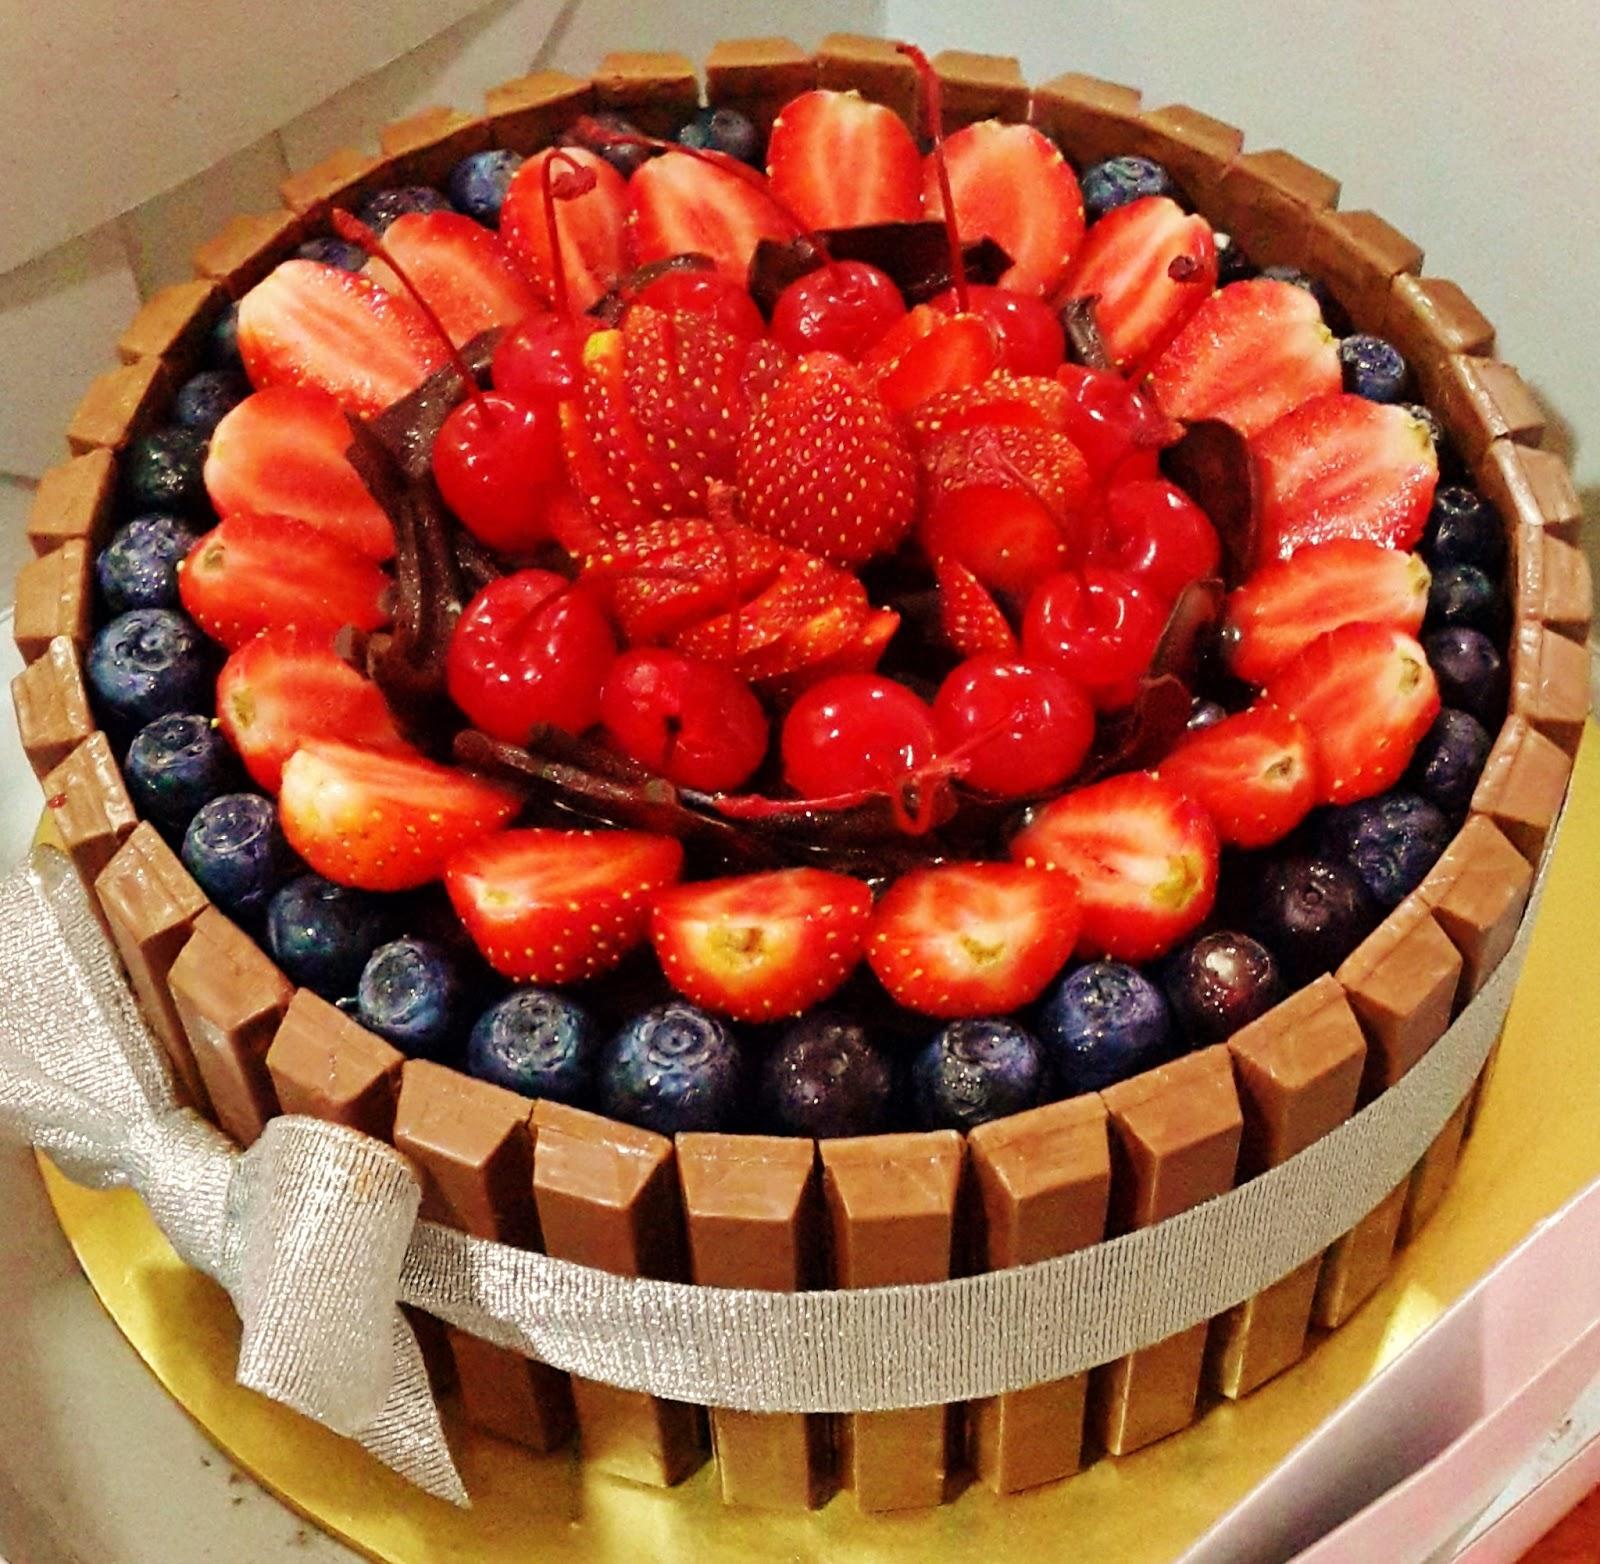 Decorating Cakes With Praline